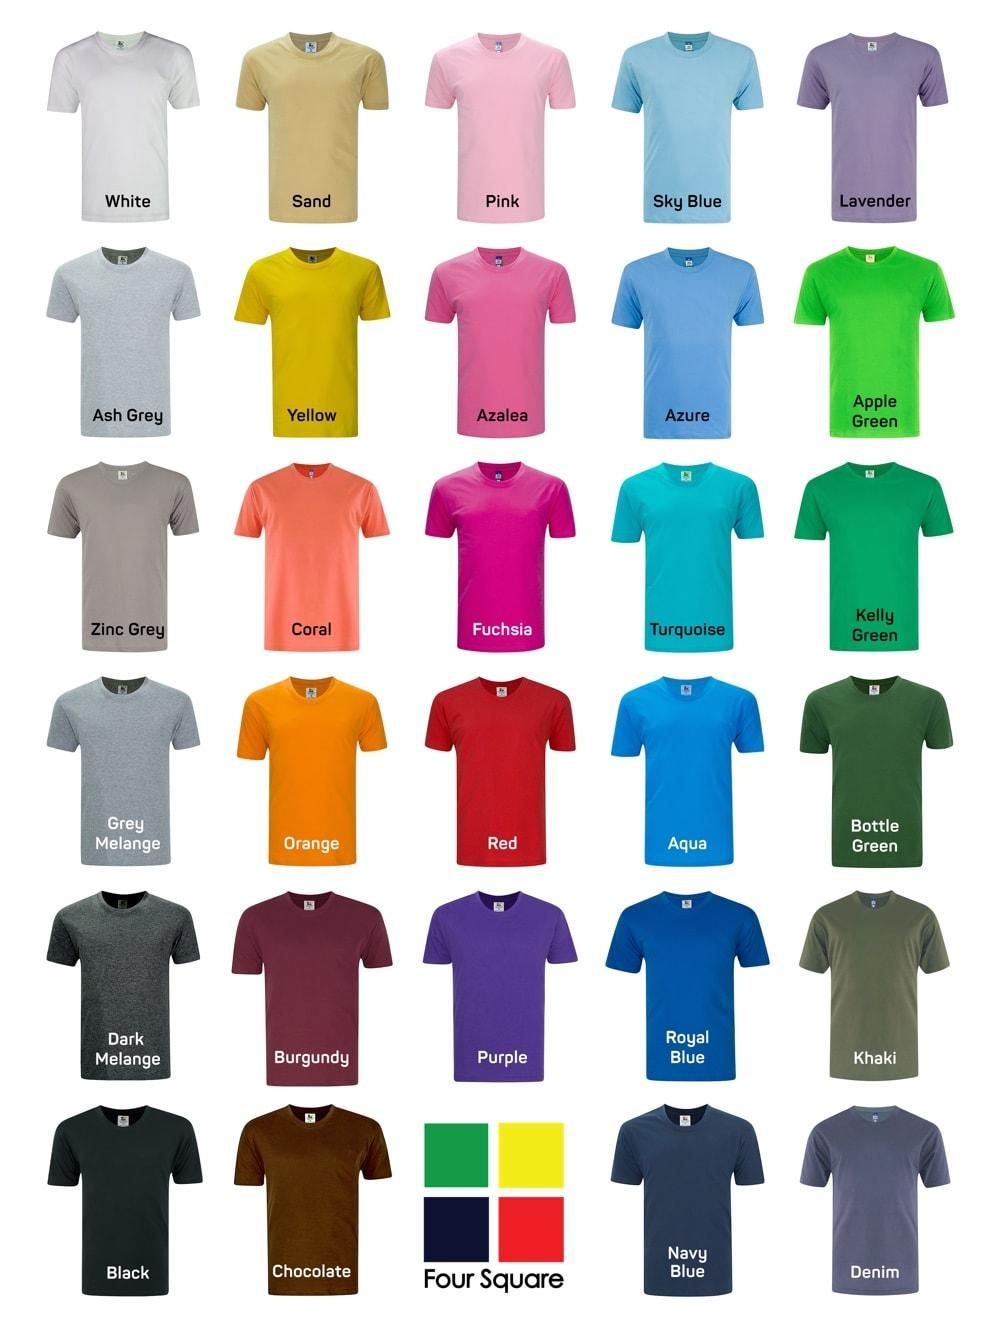 Cotton T Shirt Ing Guide 2019